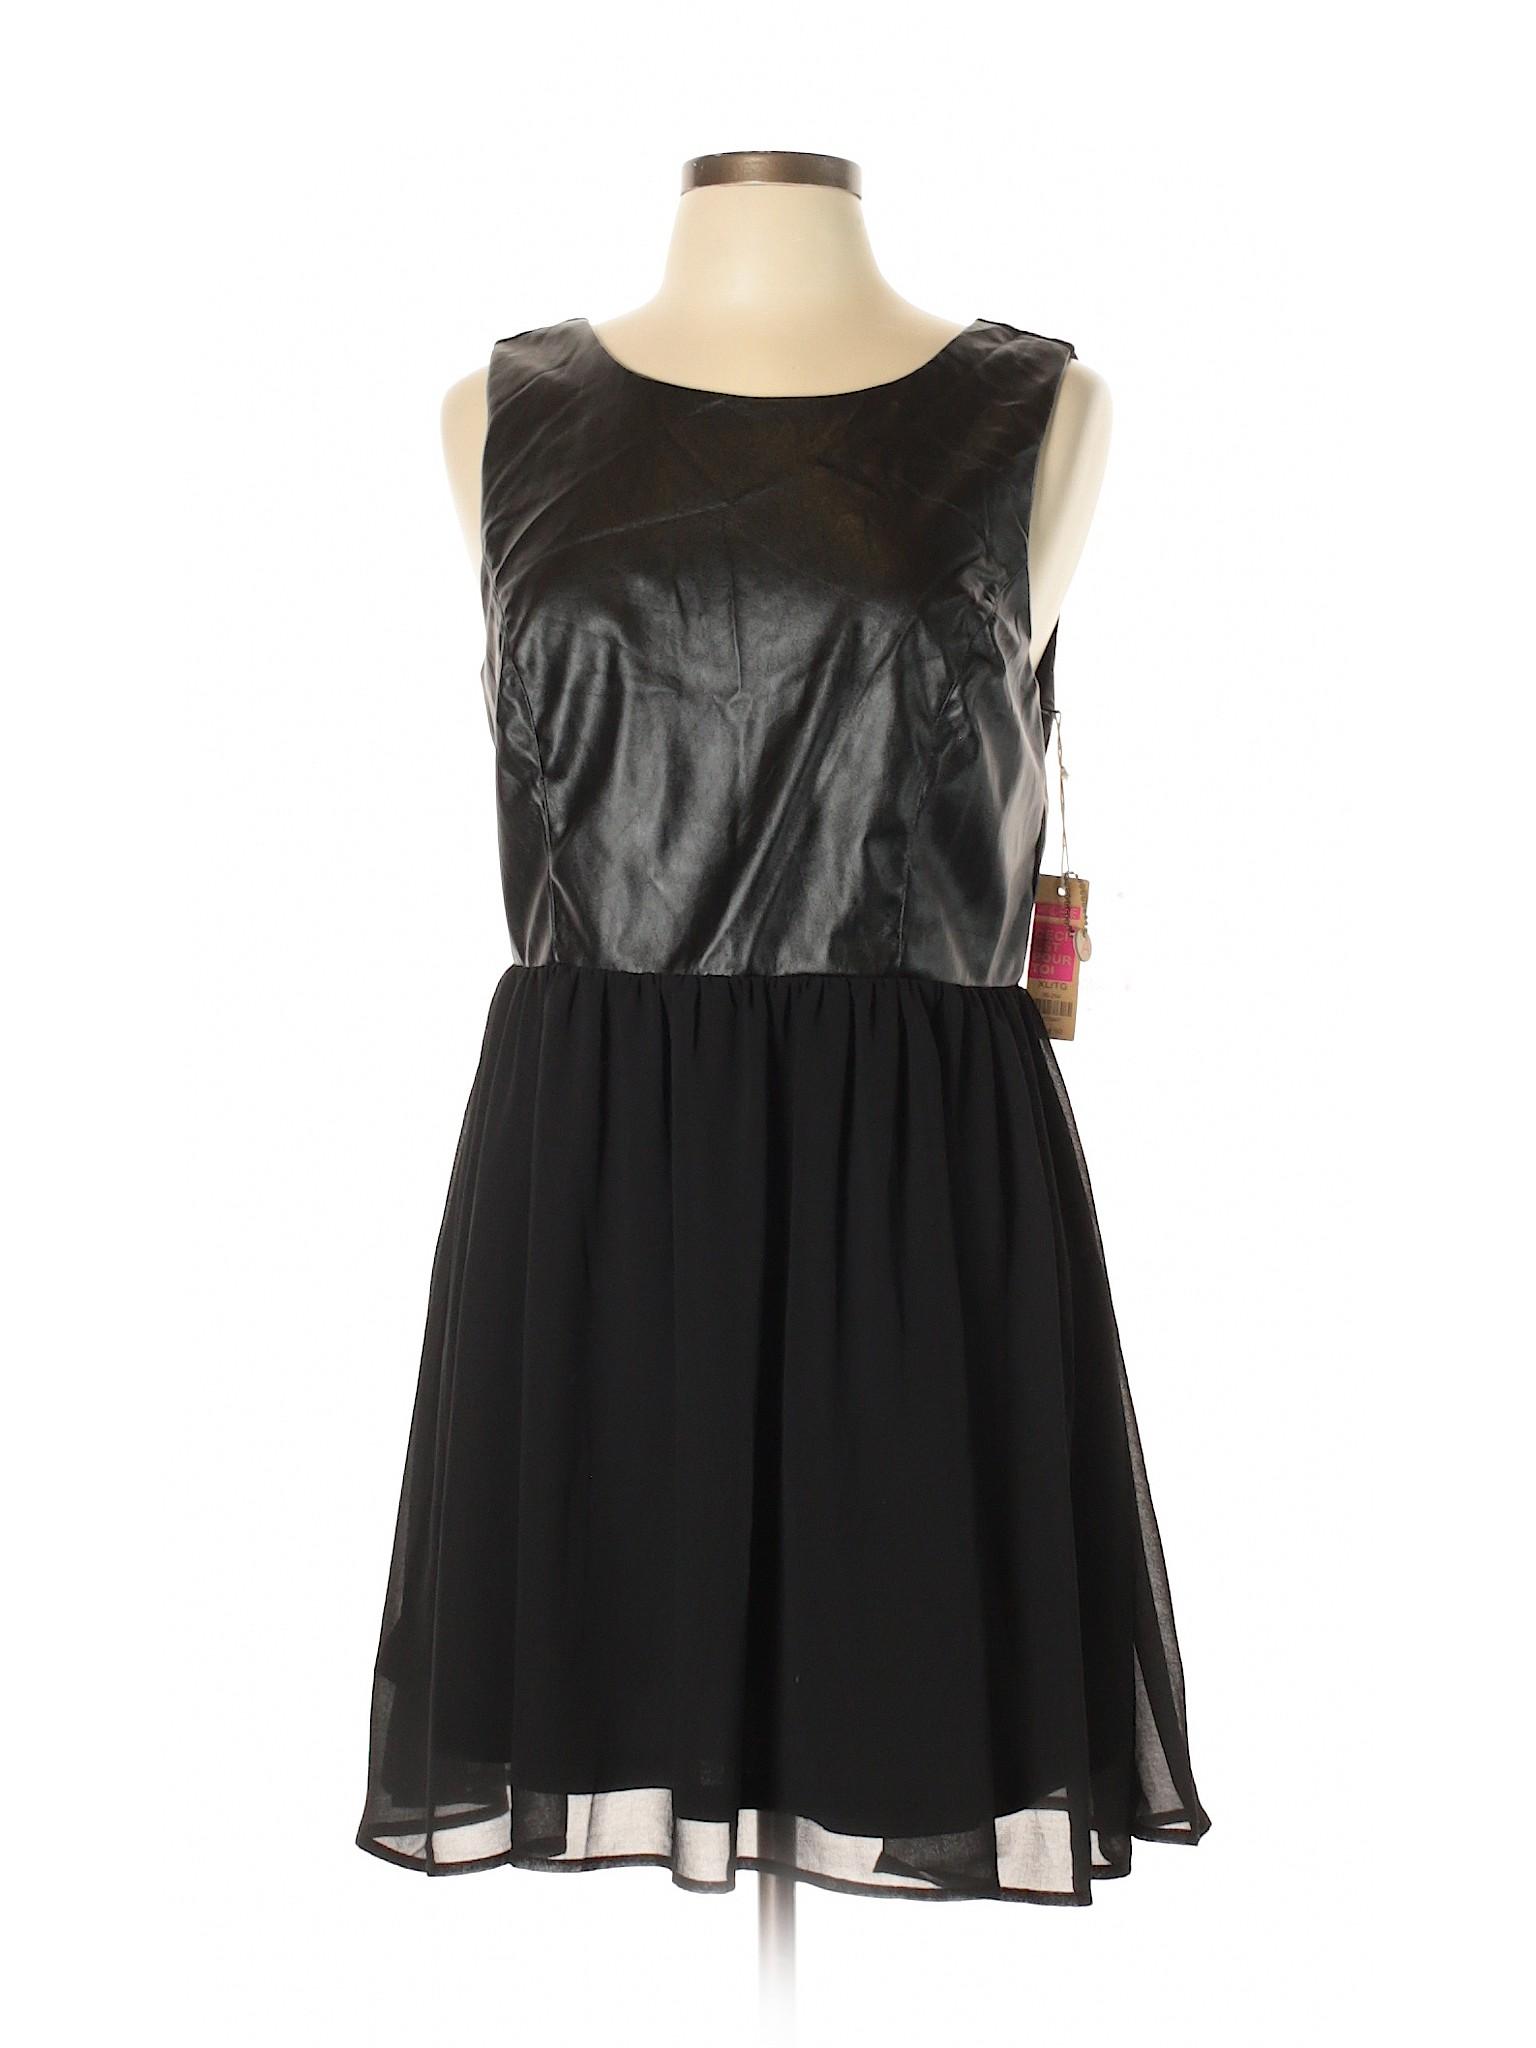 Selling Casual Ardene Ardene Dress Casual Dress Selling Selling qxZpE5nY